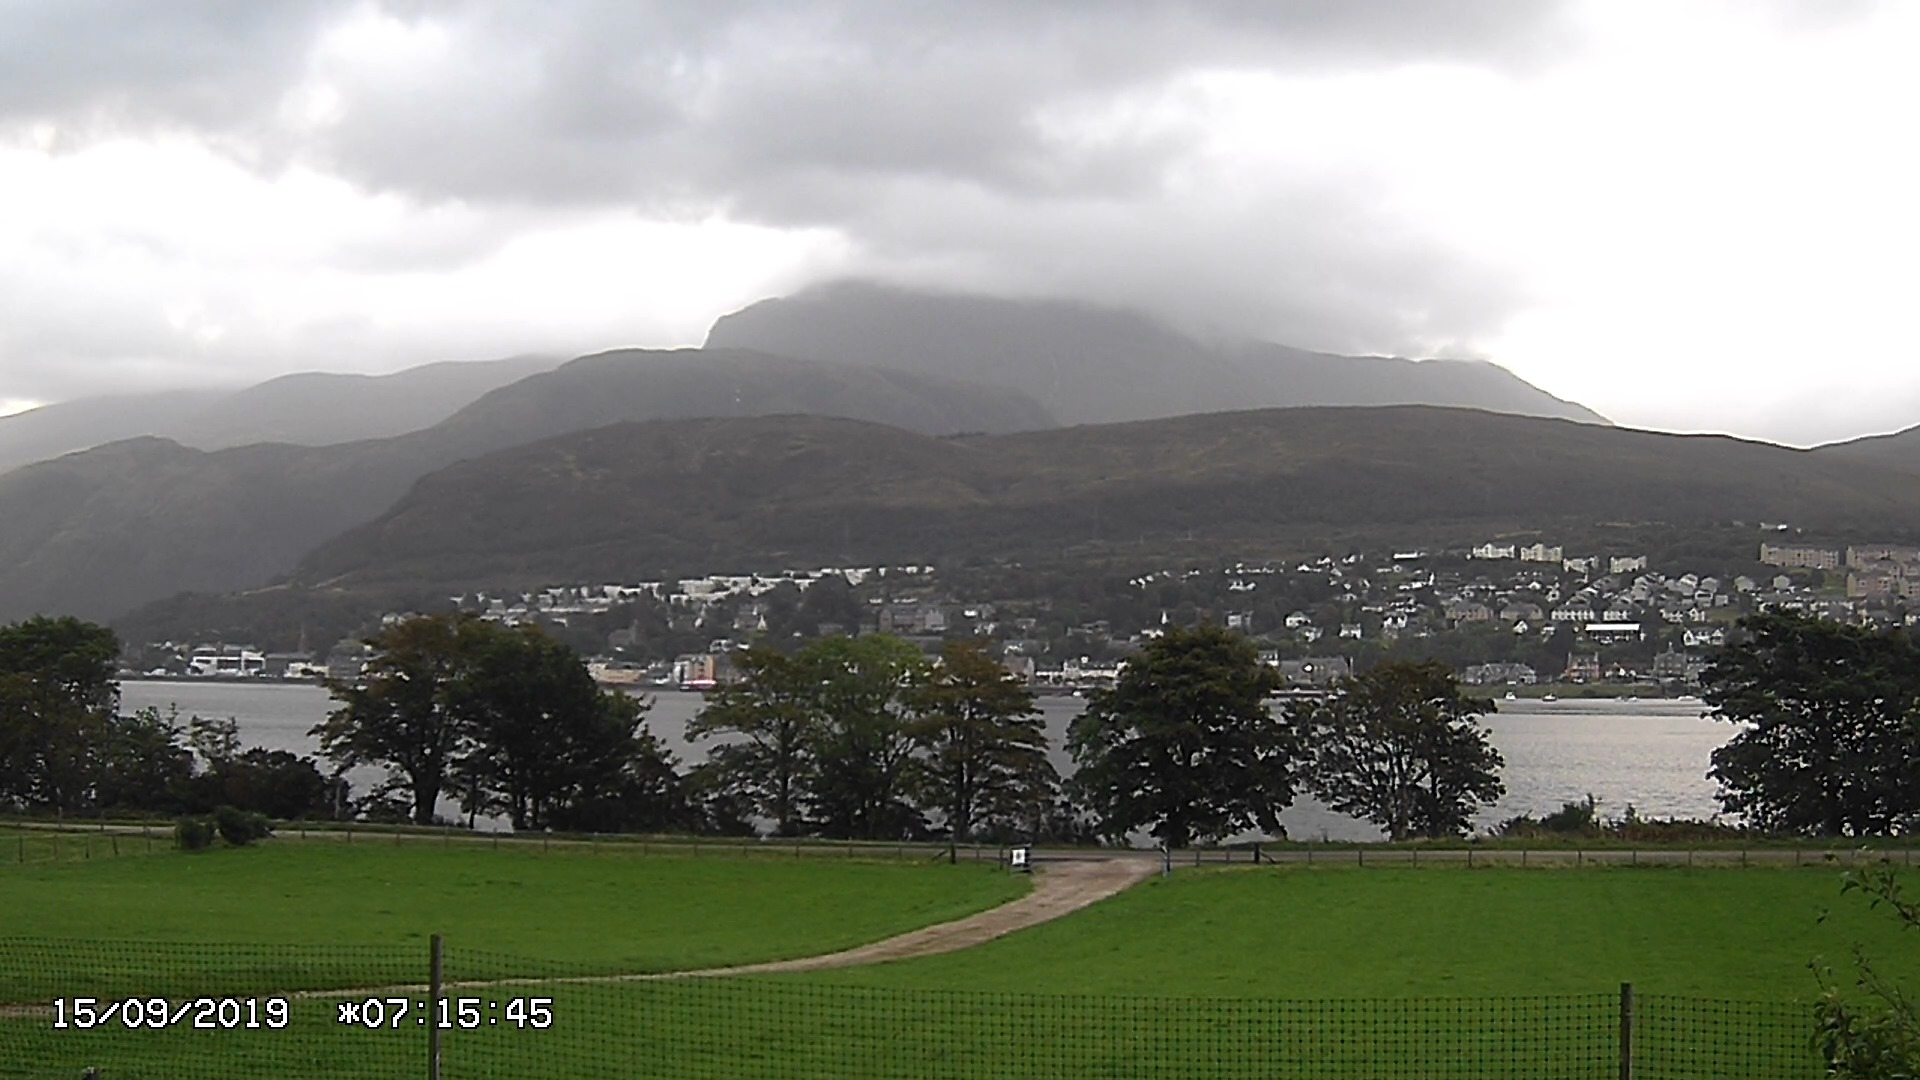 Latest Ben Nevis Webcam Image